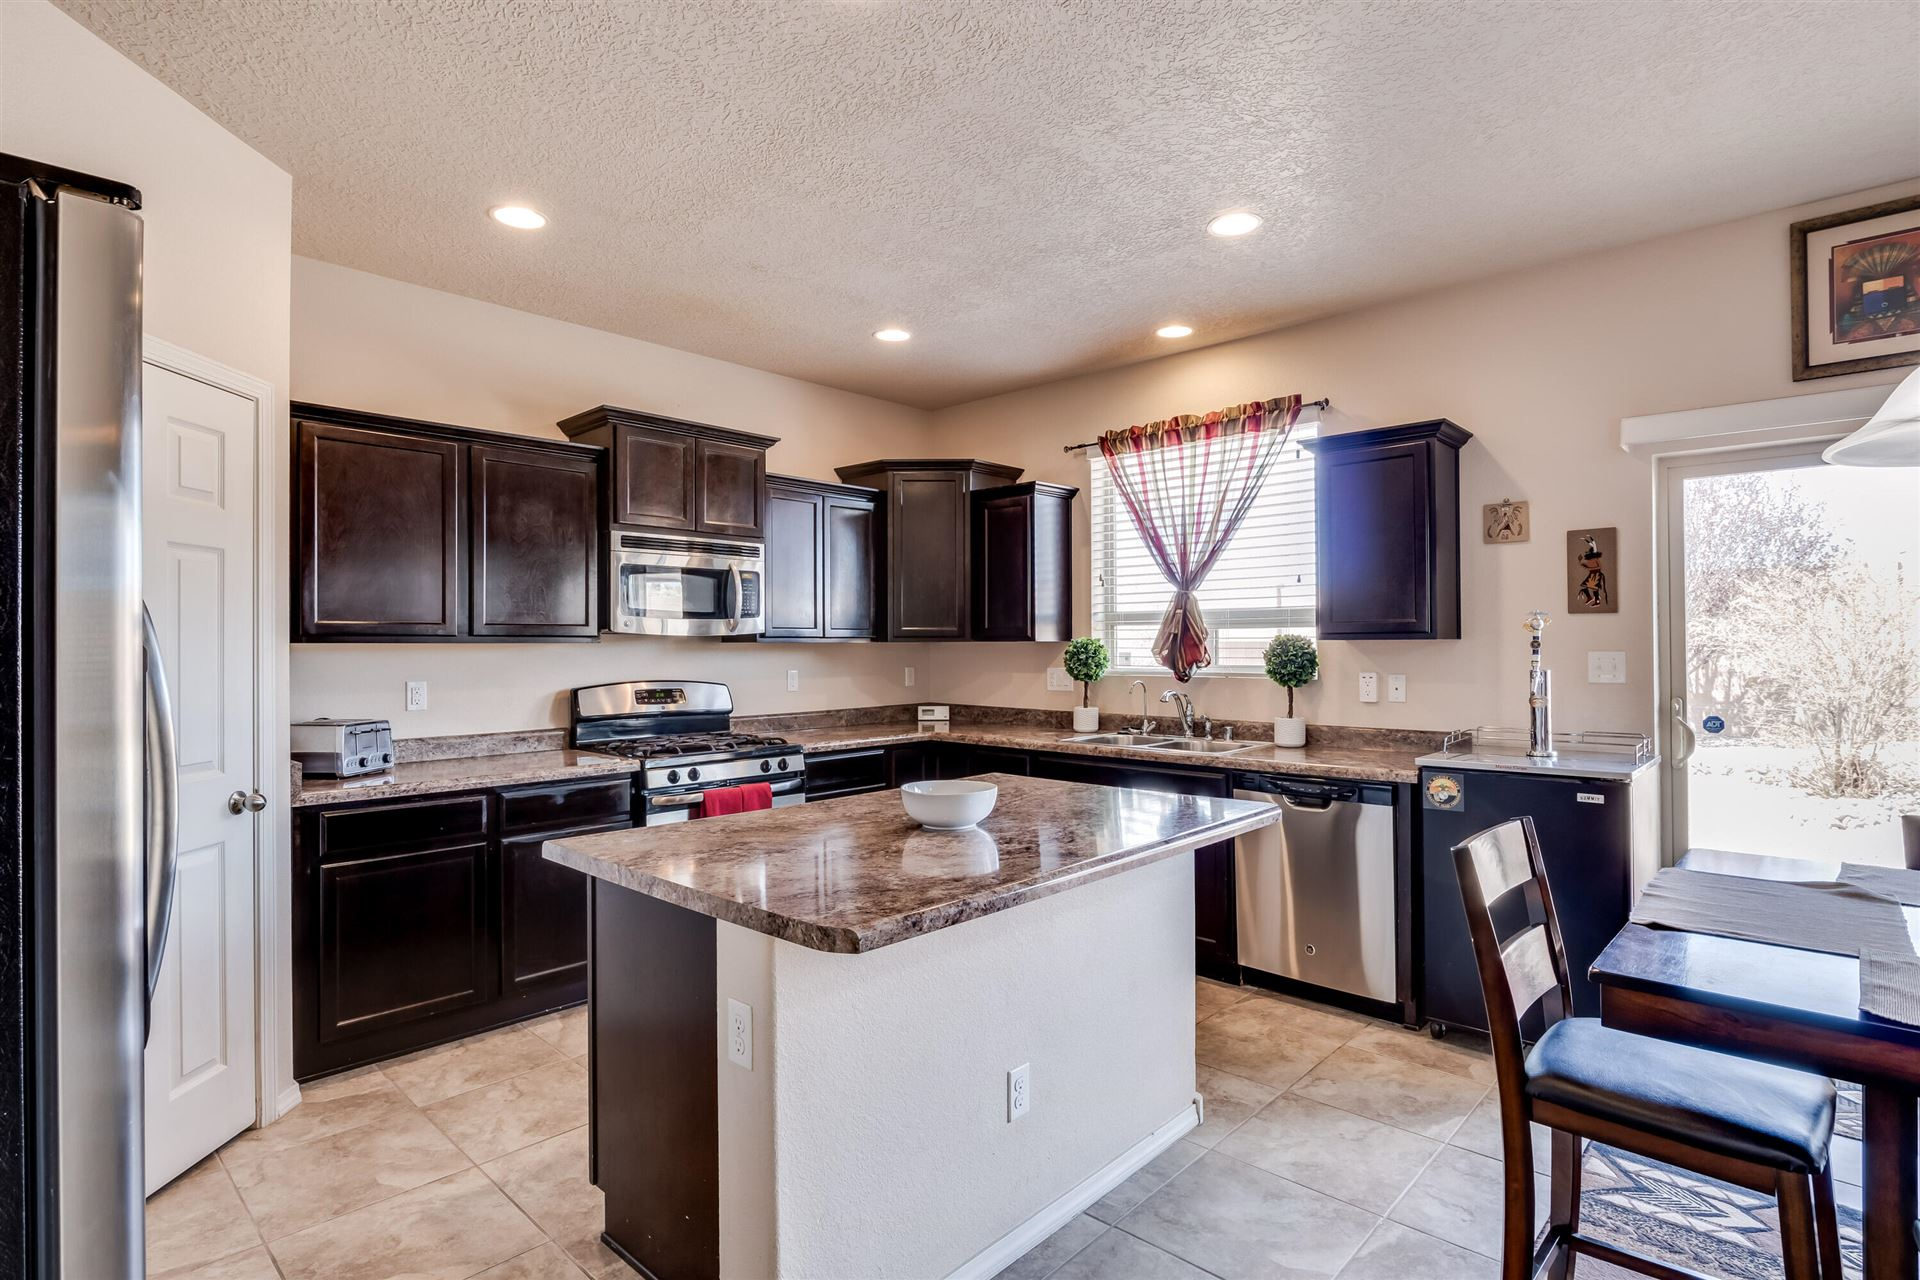 Photo of 1440 DESERT PAINTBRUSH Loop NE, Rio Rancho, NM 87144 (MLS # 989320)